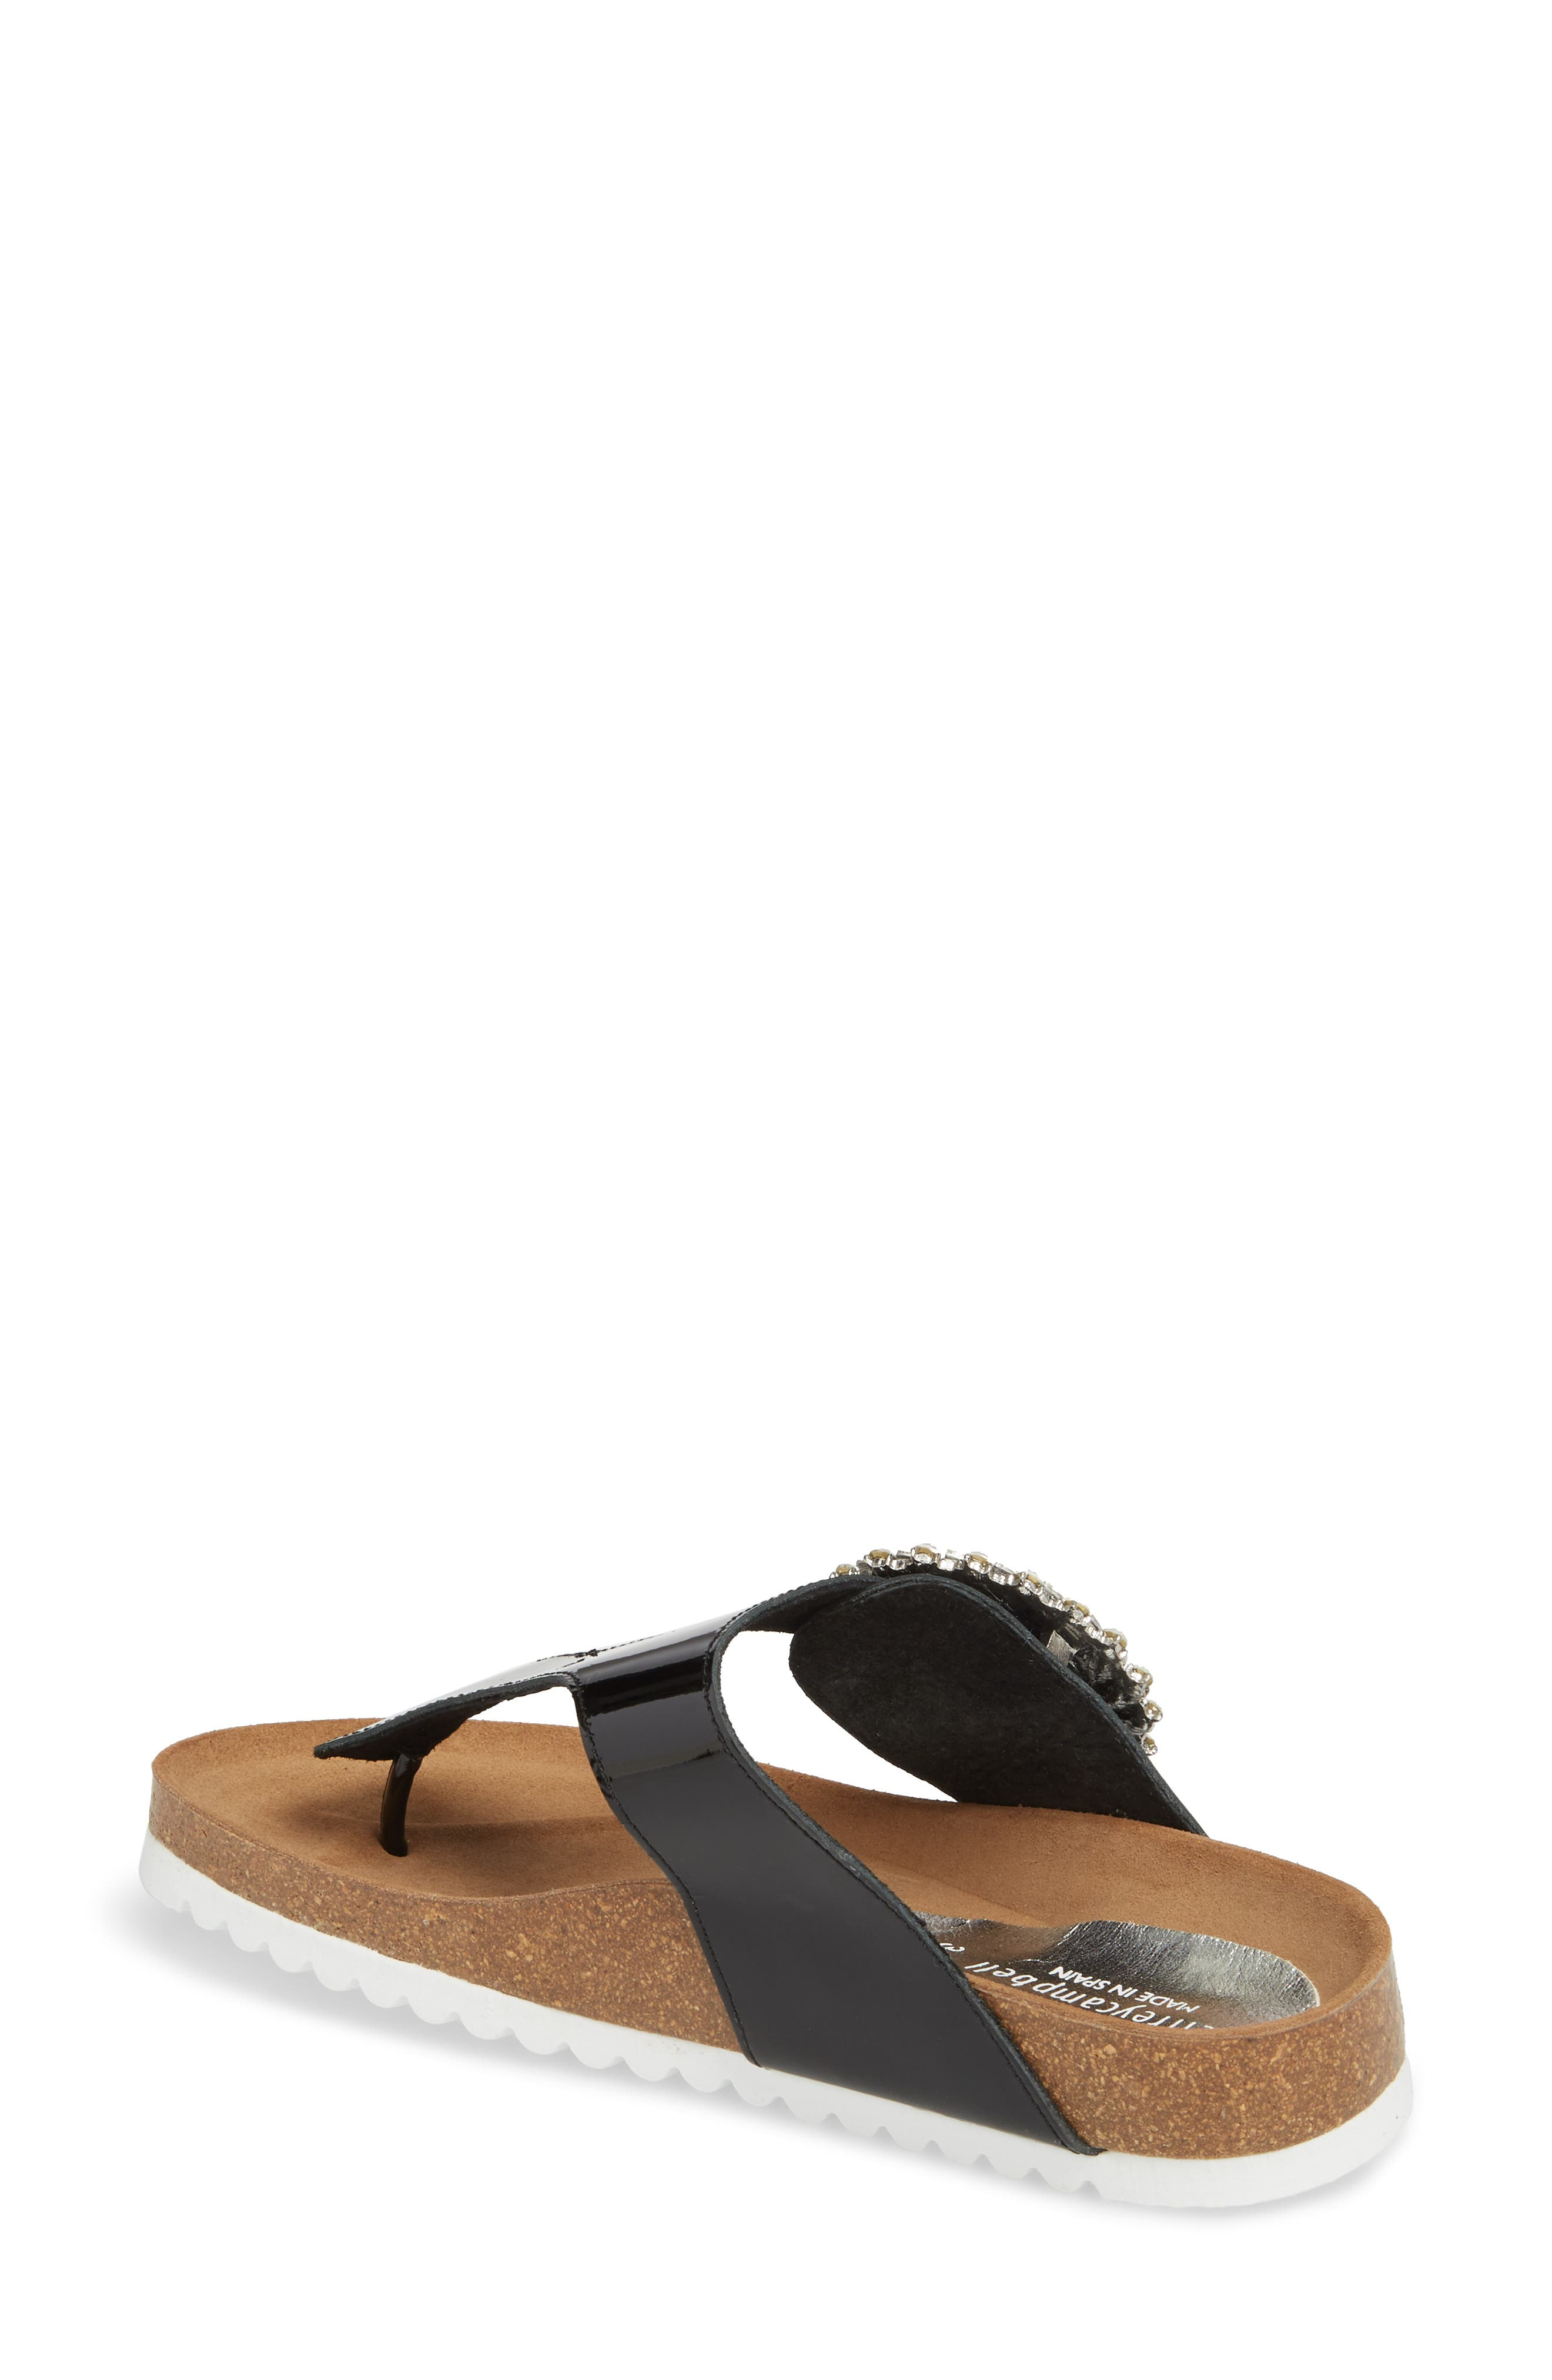 Madeira Embellished T-Strap Sandal,                             Alternate thumbnail 2, color,                             Black Patent/ Black Silver